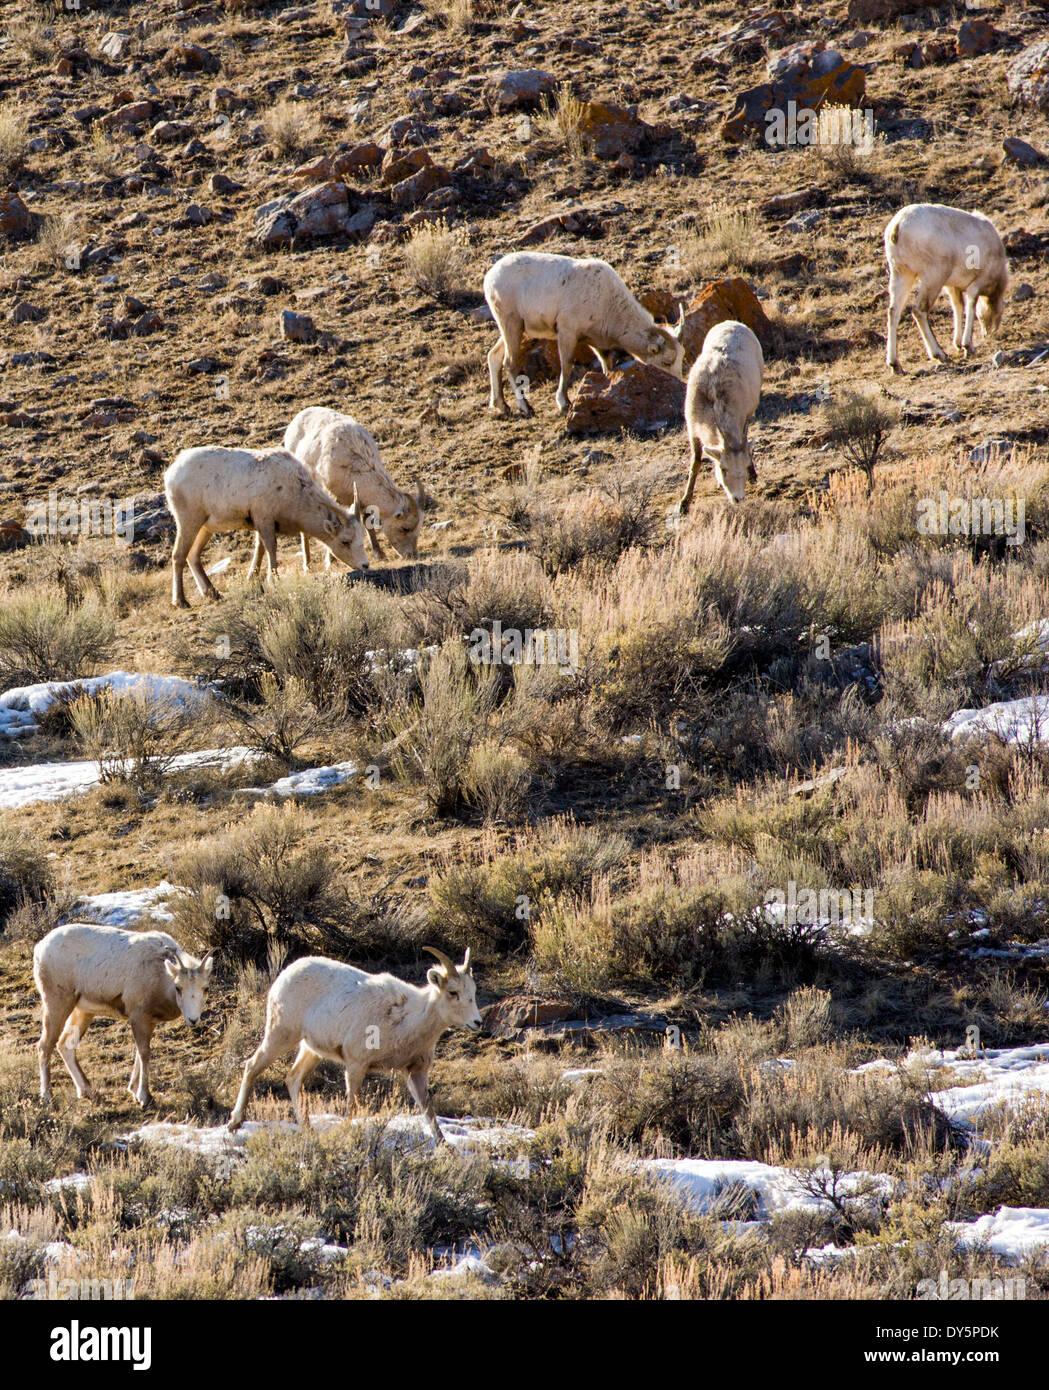 Bighorn Sheep, ewes and lambs, Ovis Canadensis, near Jackson Hole, Wyoming, USA - Stock Image